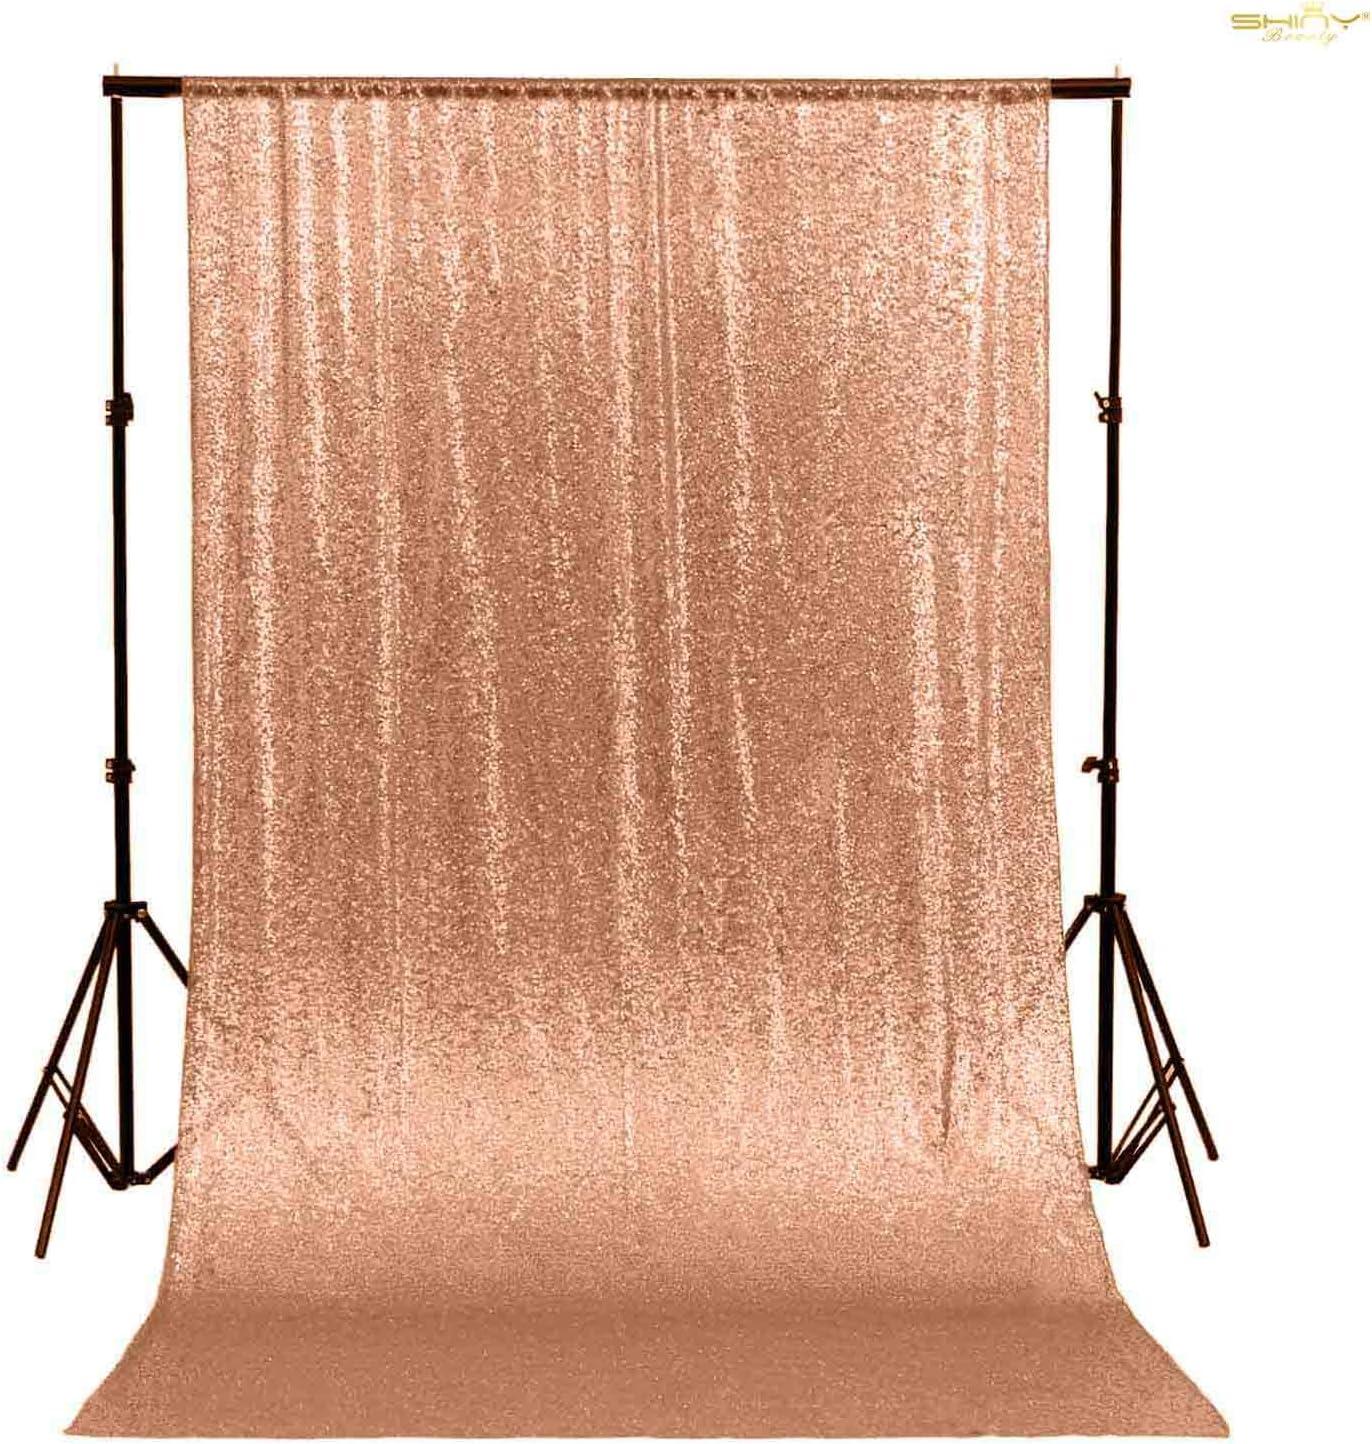 Shinybeauty Rose Gold Pailletten Hintergrund Vorhang 50x72in Pailletten Foto Hintergrund